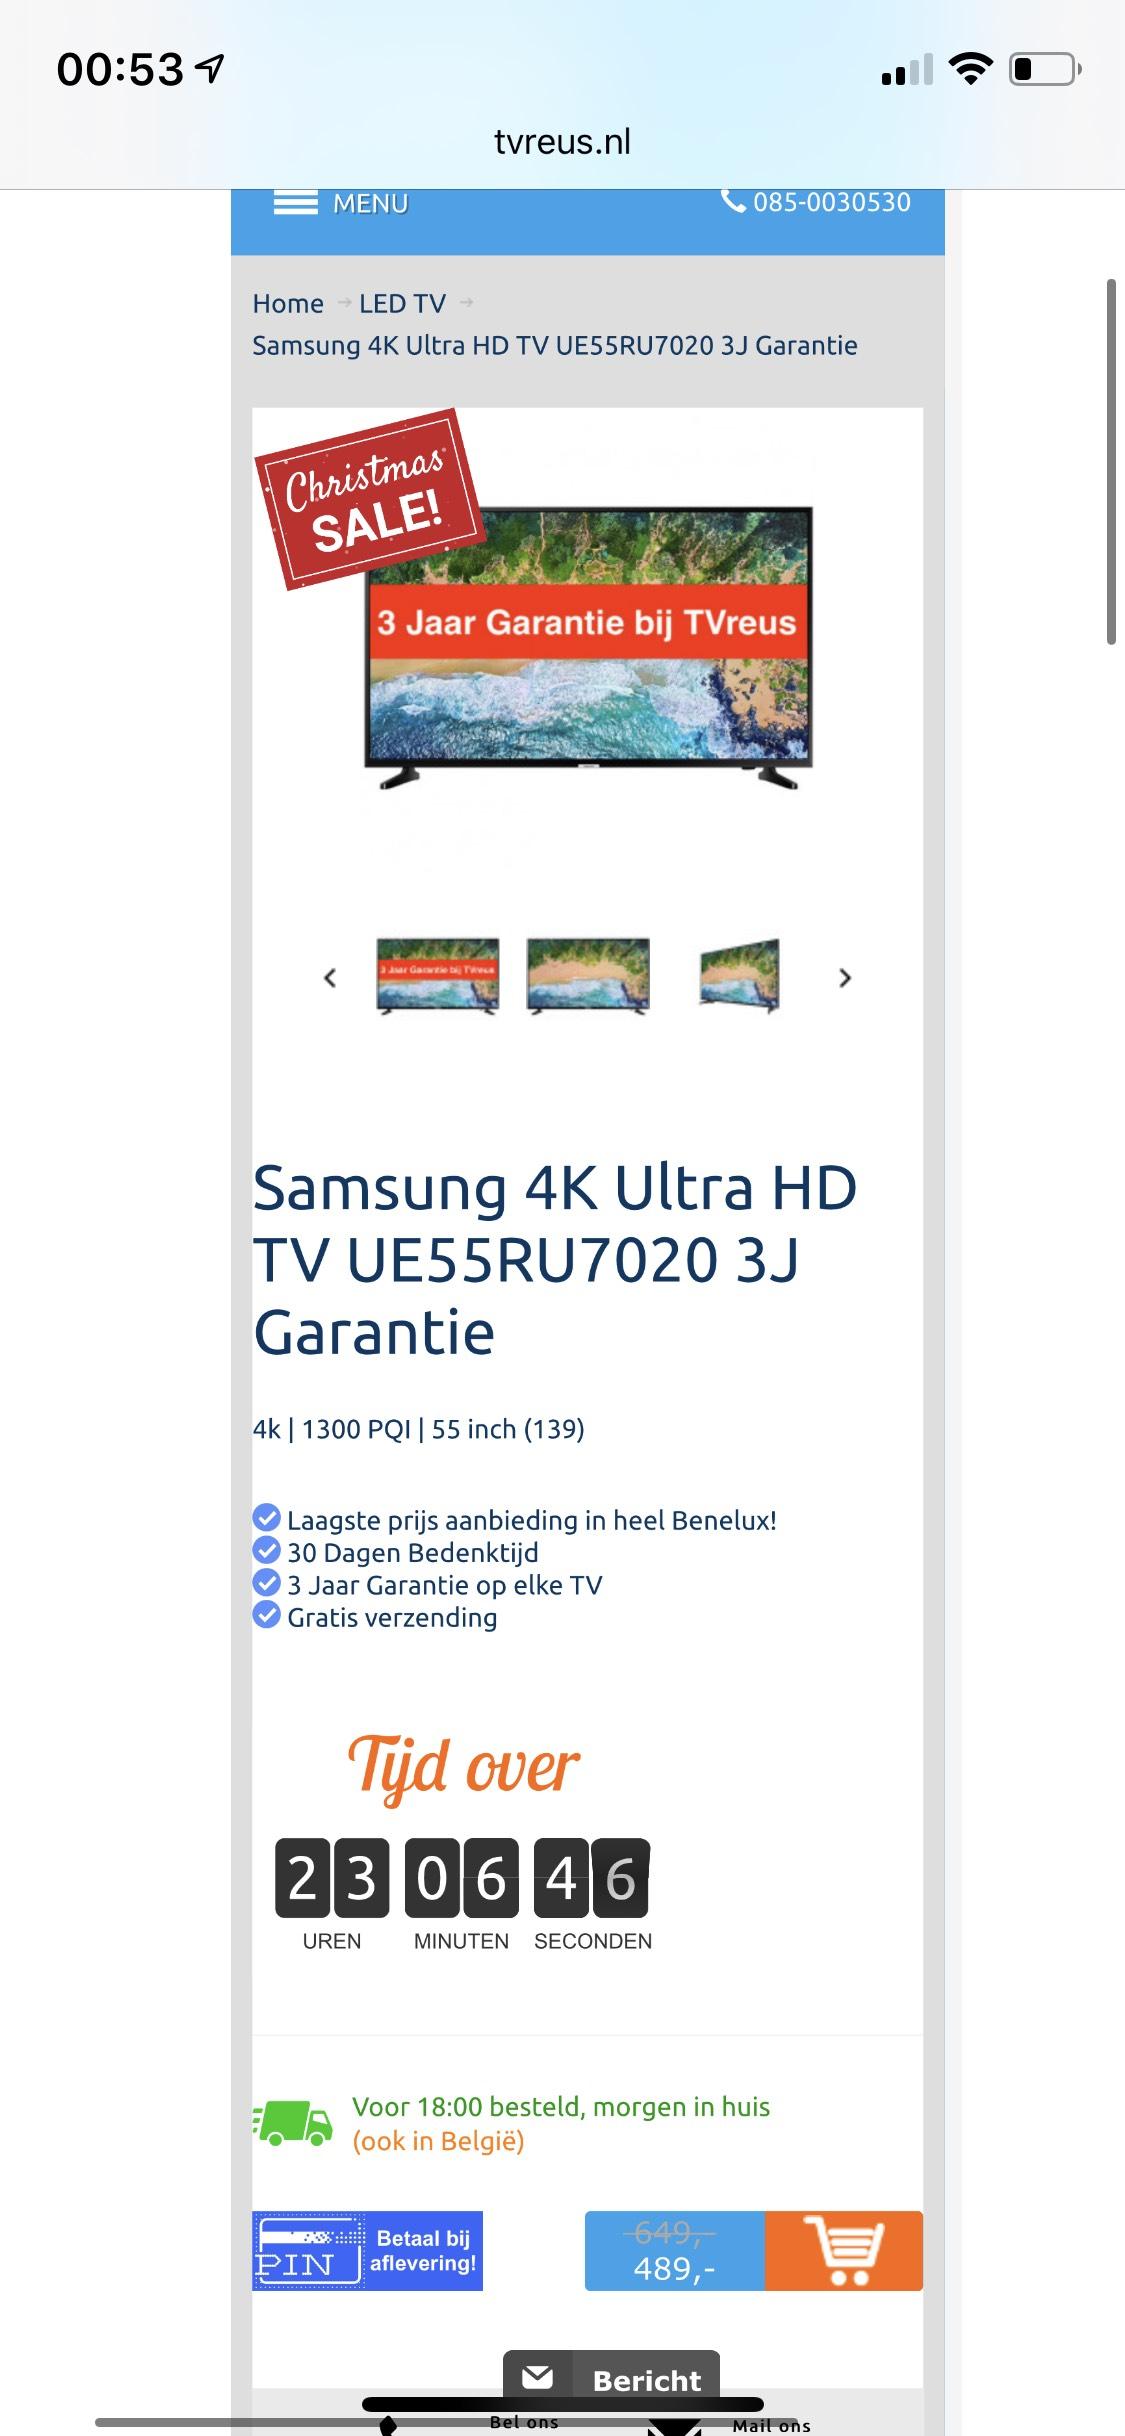 Samsung 4K Ultra HD TV 55 inch